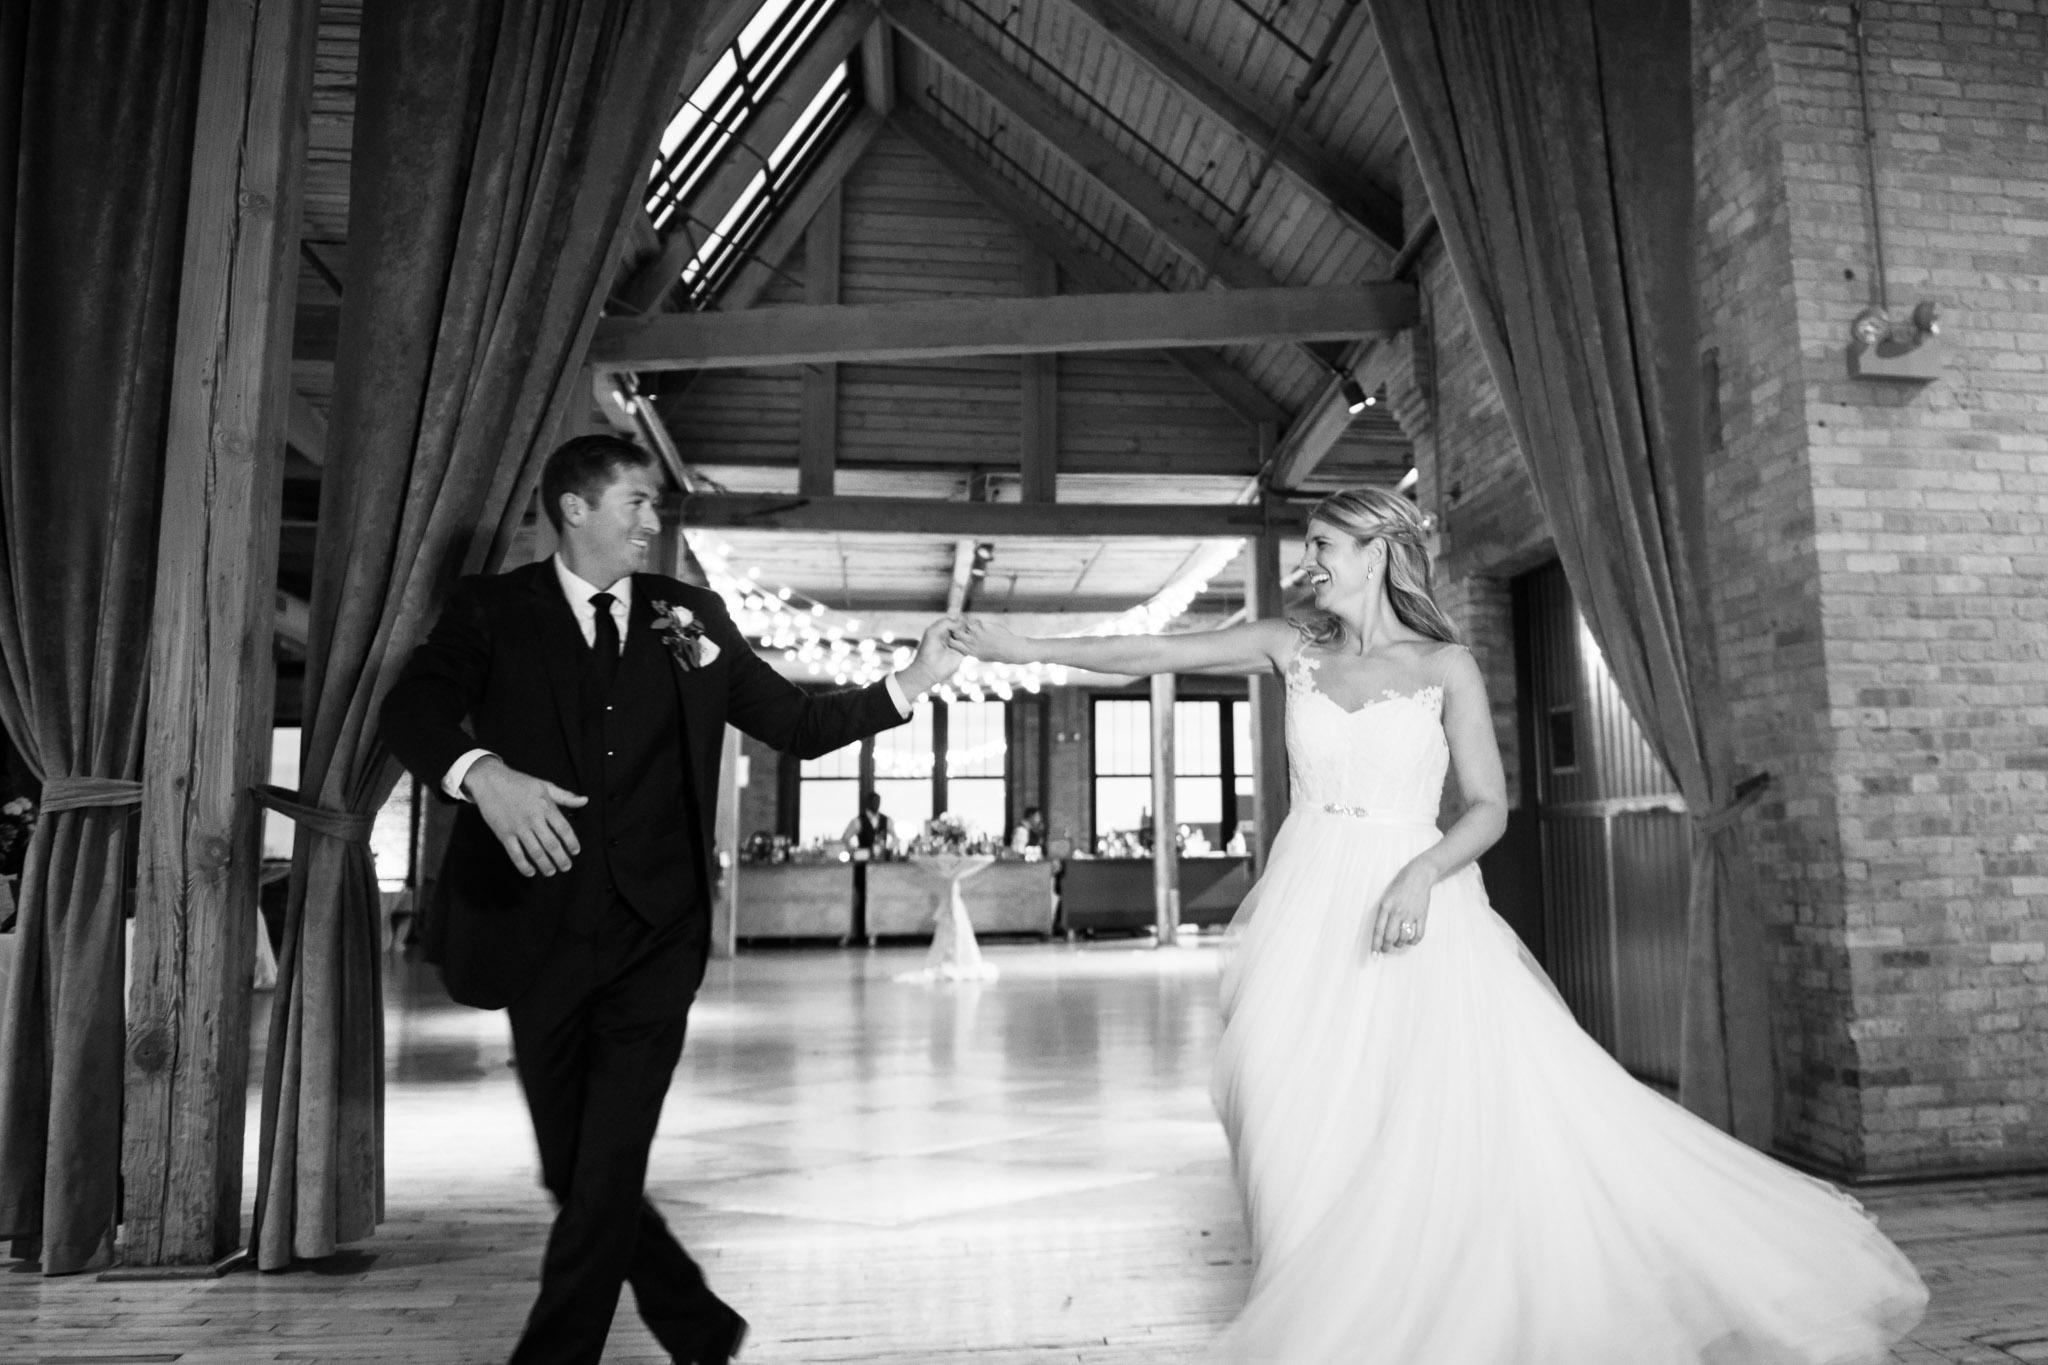 bridgeport-art-center-wedding-photos-33.jpg